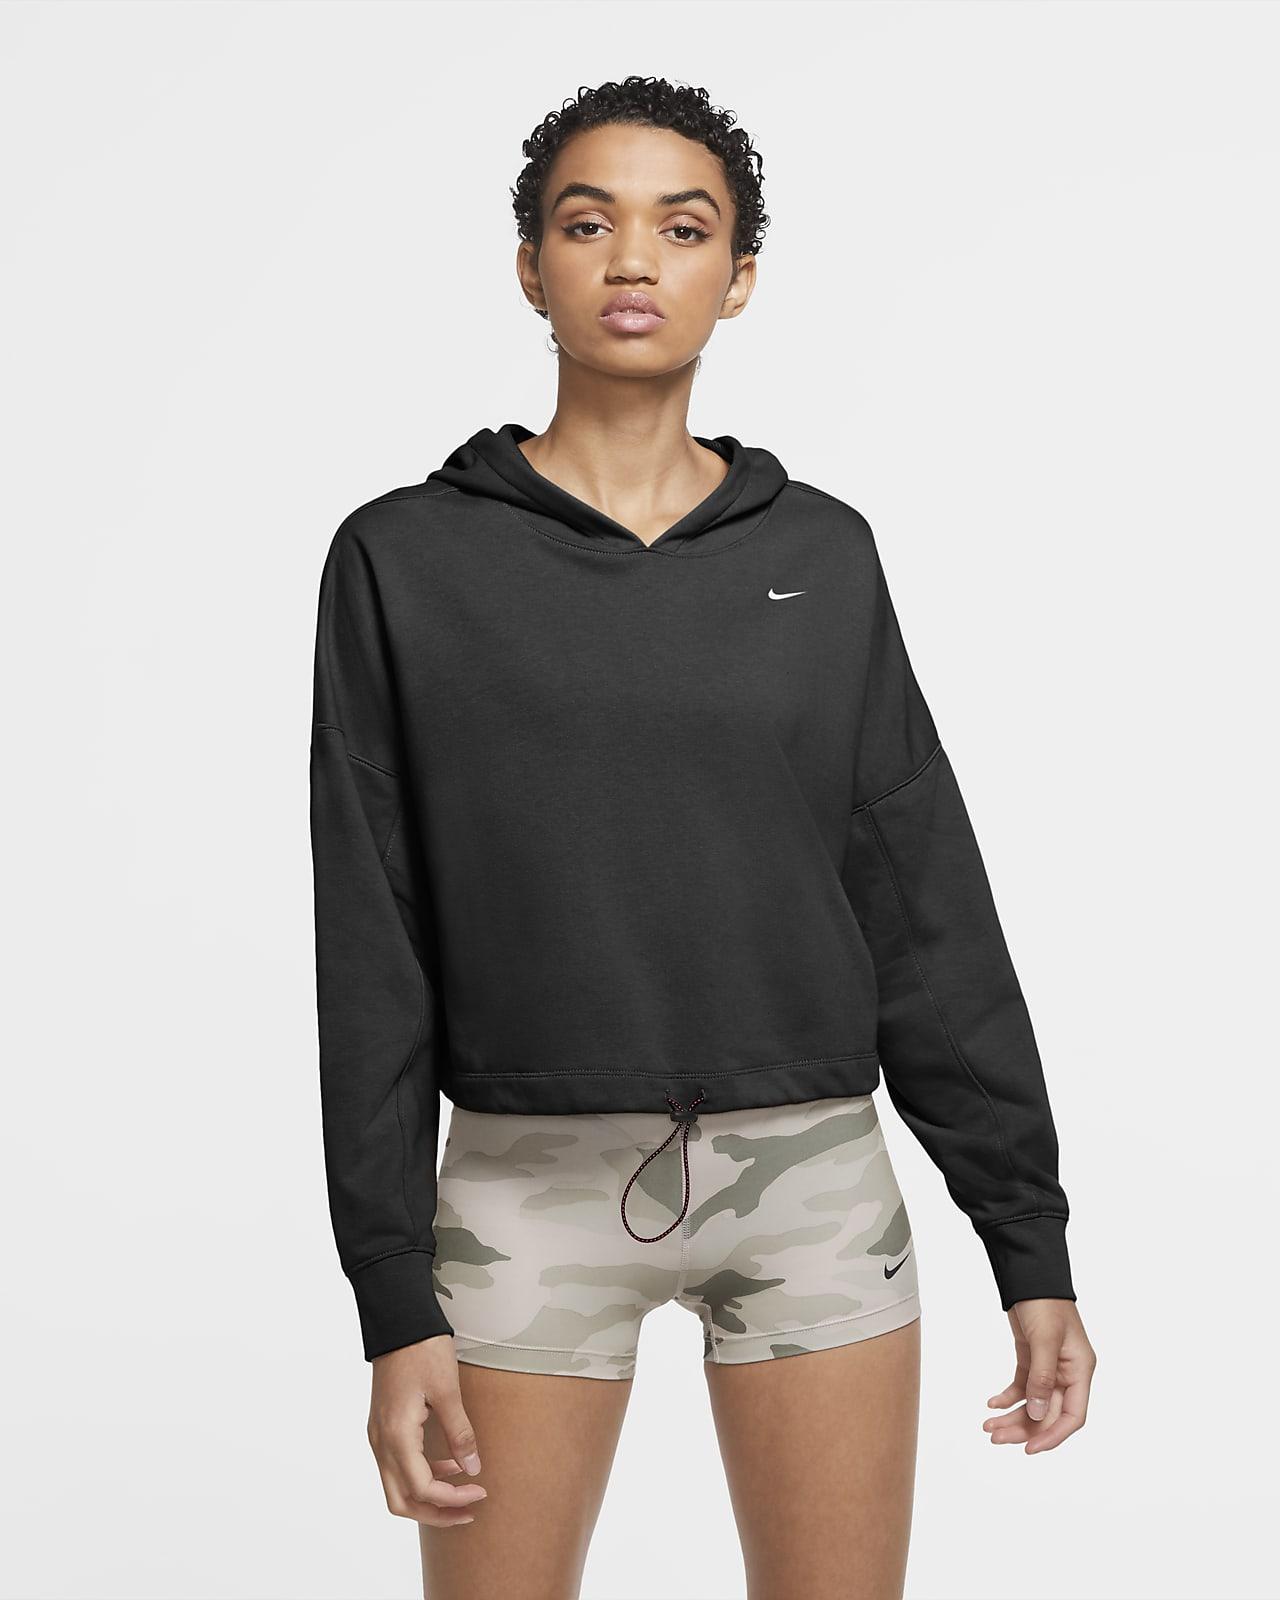 Nike Dri-FIT Icon Clash Women's Cropped Training Hoodie